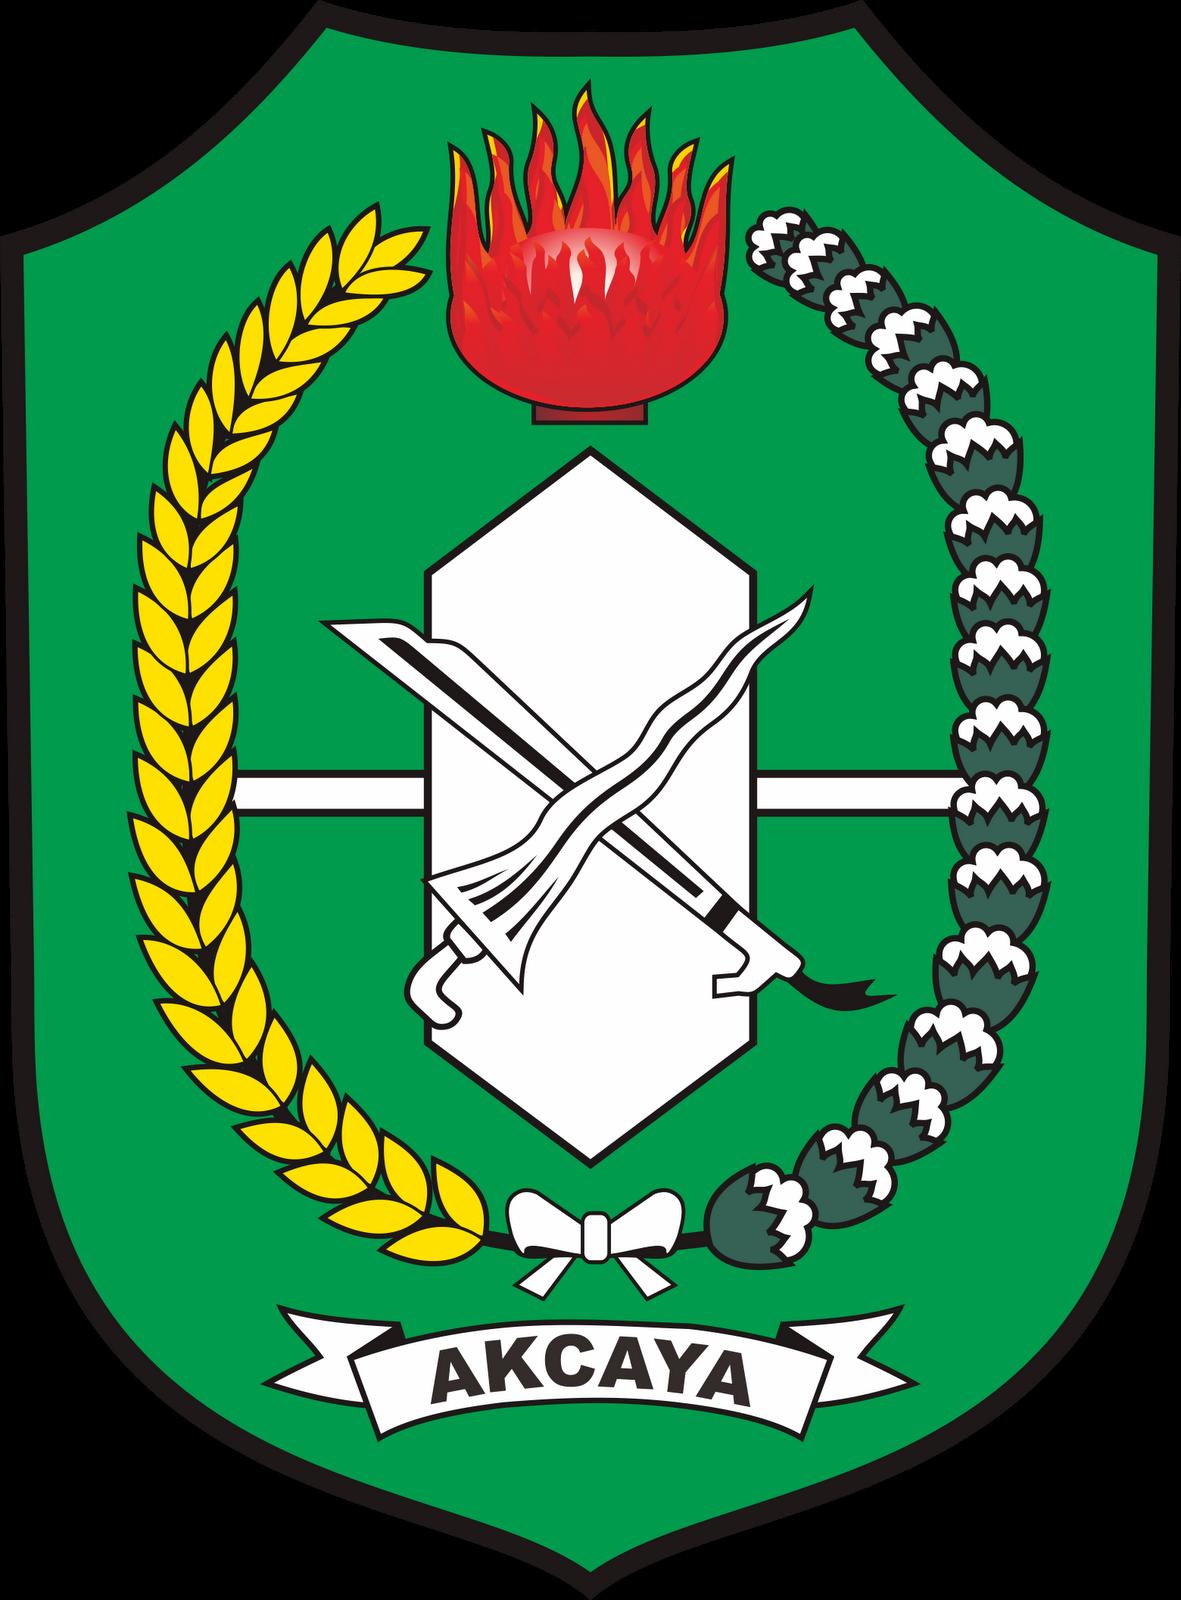 Kalimantan Barat Kalimantan, Kota